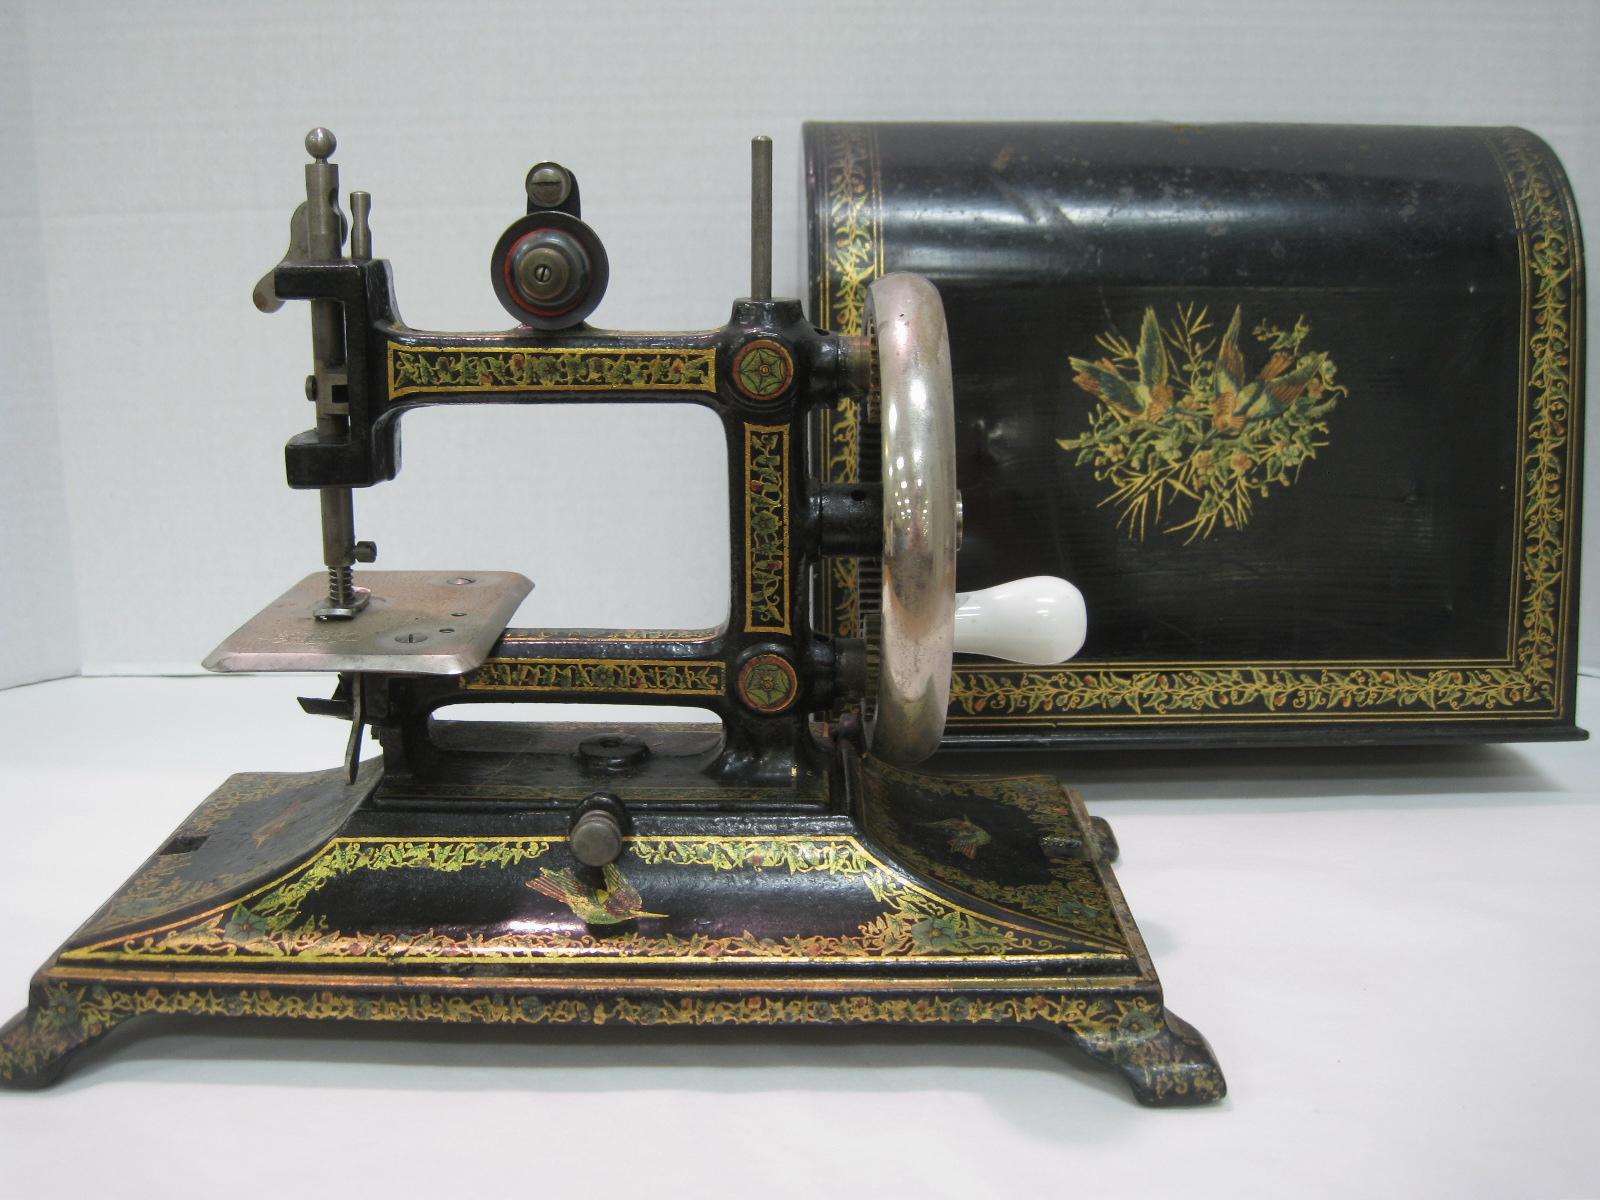 antique sewing machines. Black Bedroom Furniture Sets. Home Design Ideas